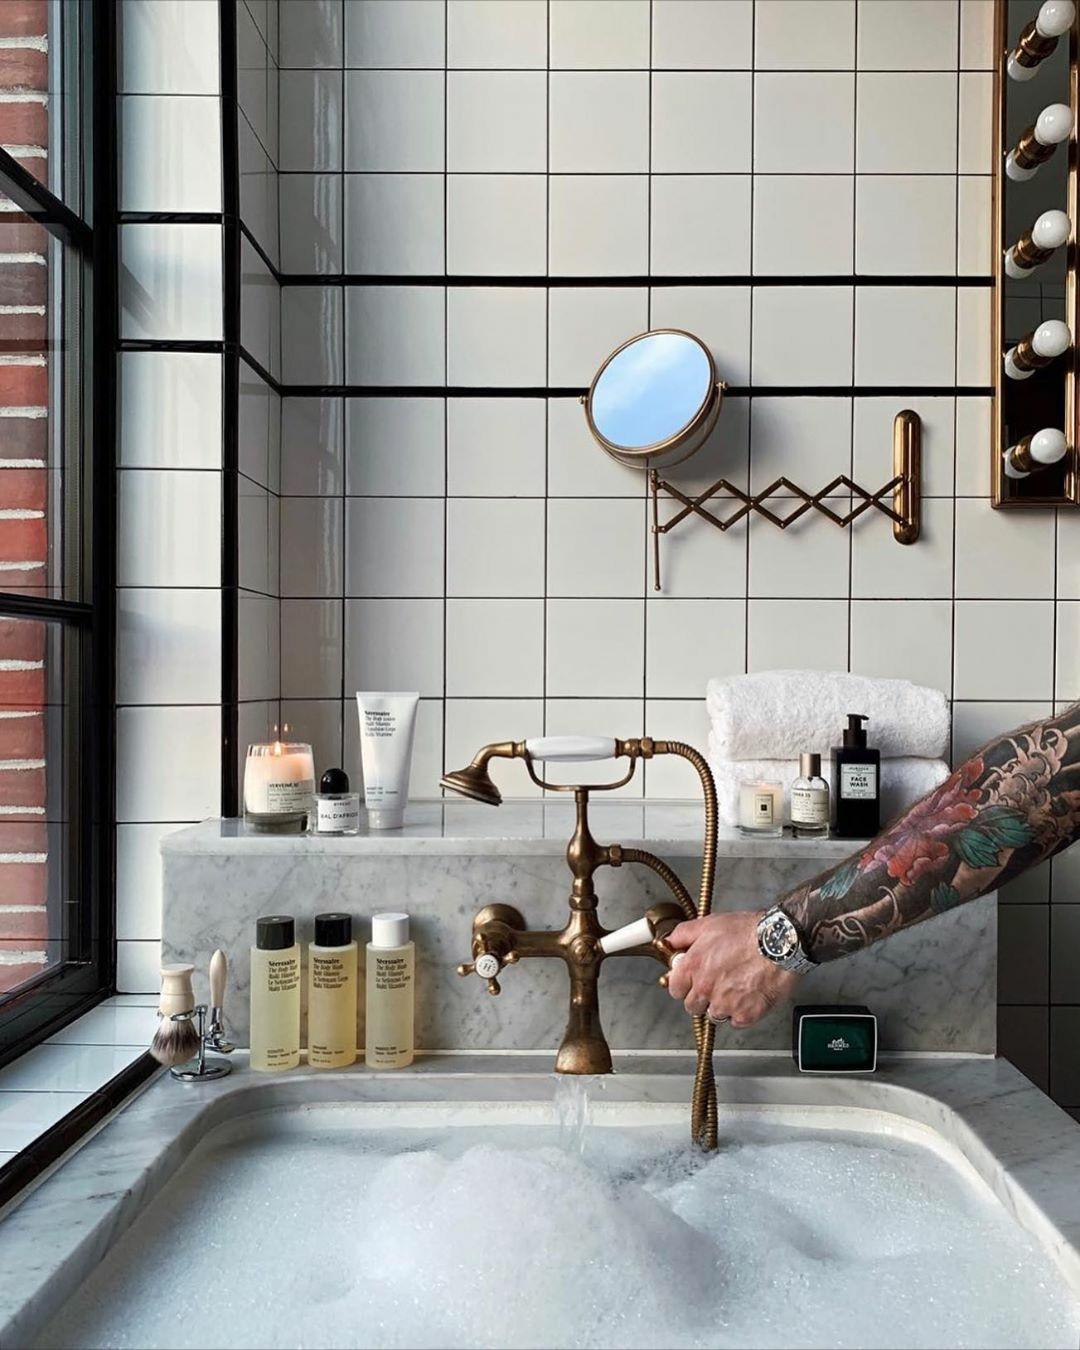 bath time, bubble bath, and comfy image